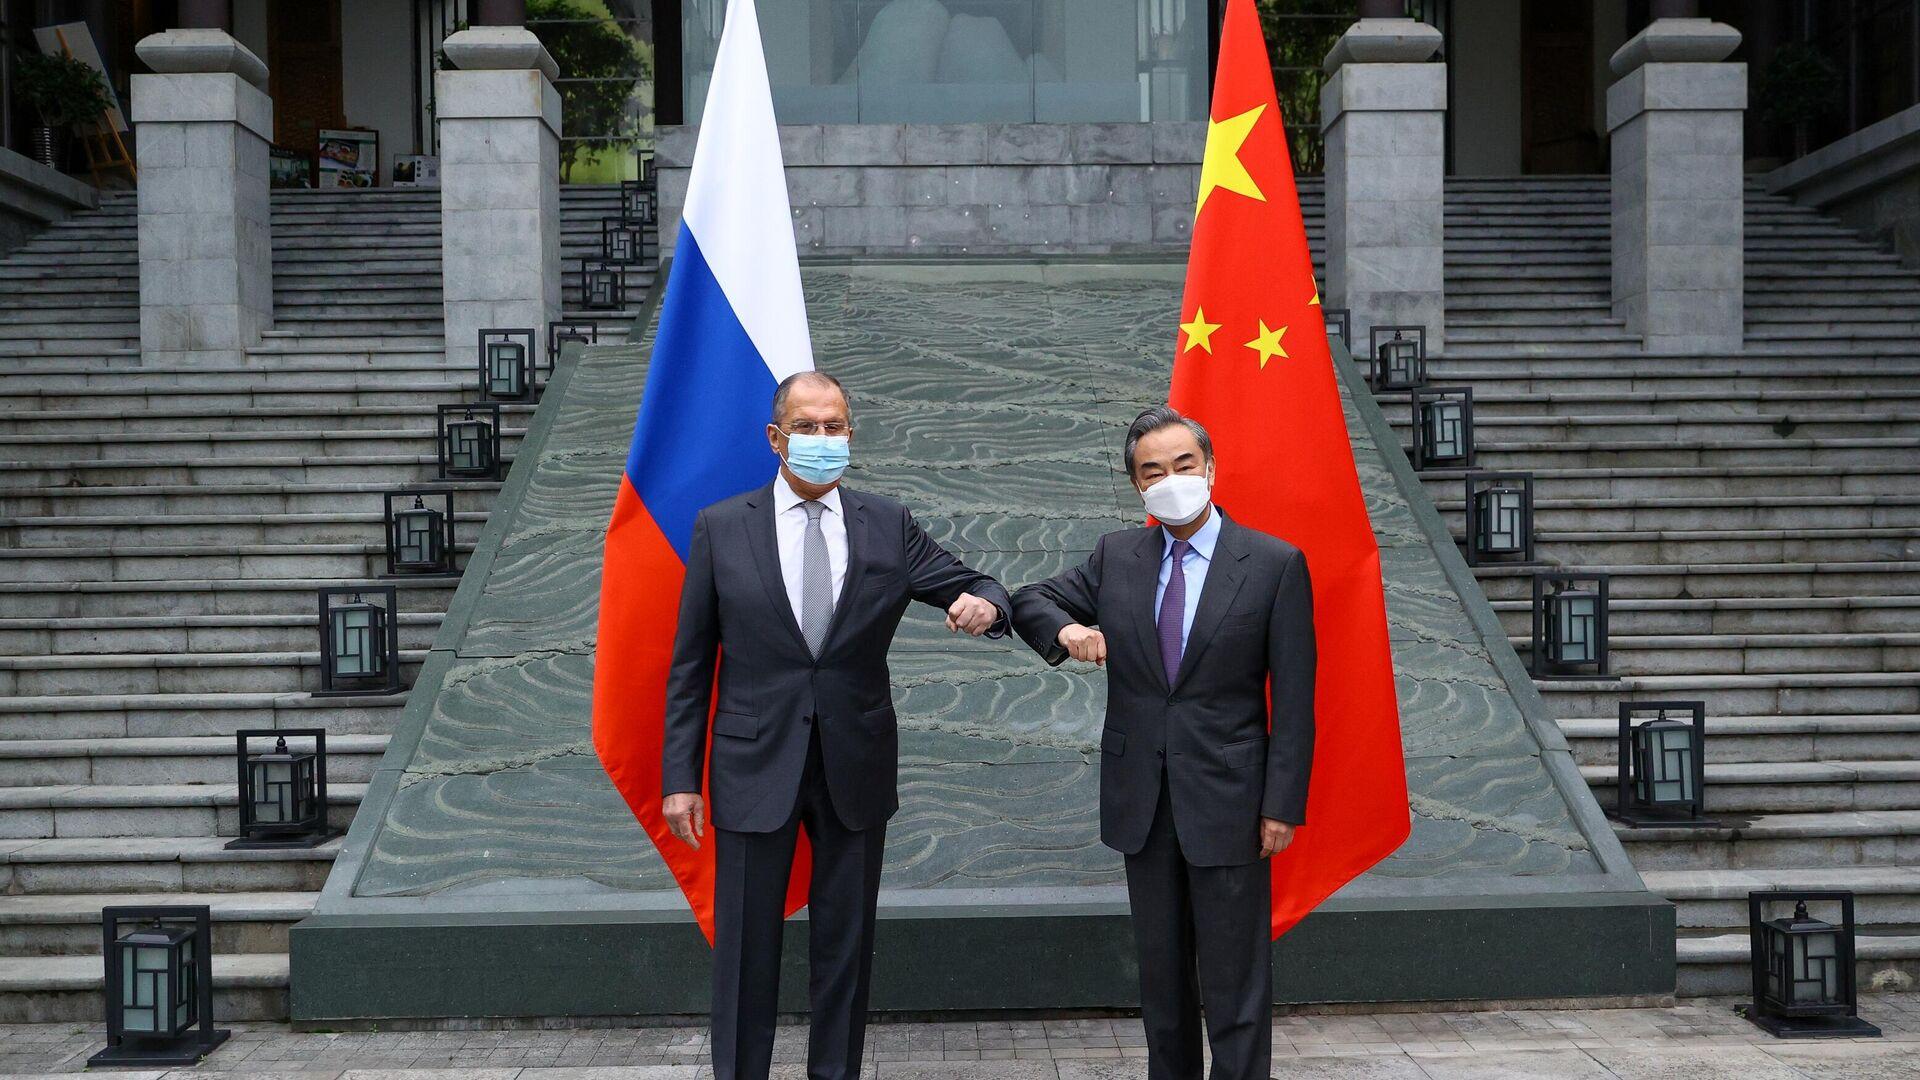 El canciller ruso, Serguéi Lavrov, y su homólogo chino, Wang Yi - Sputnik Mundo, 1920, 24.03.2021